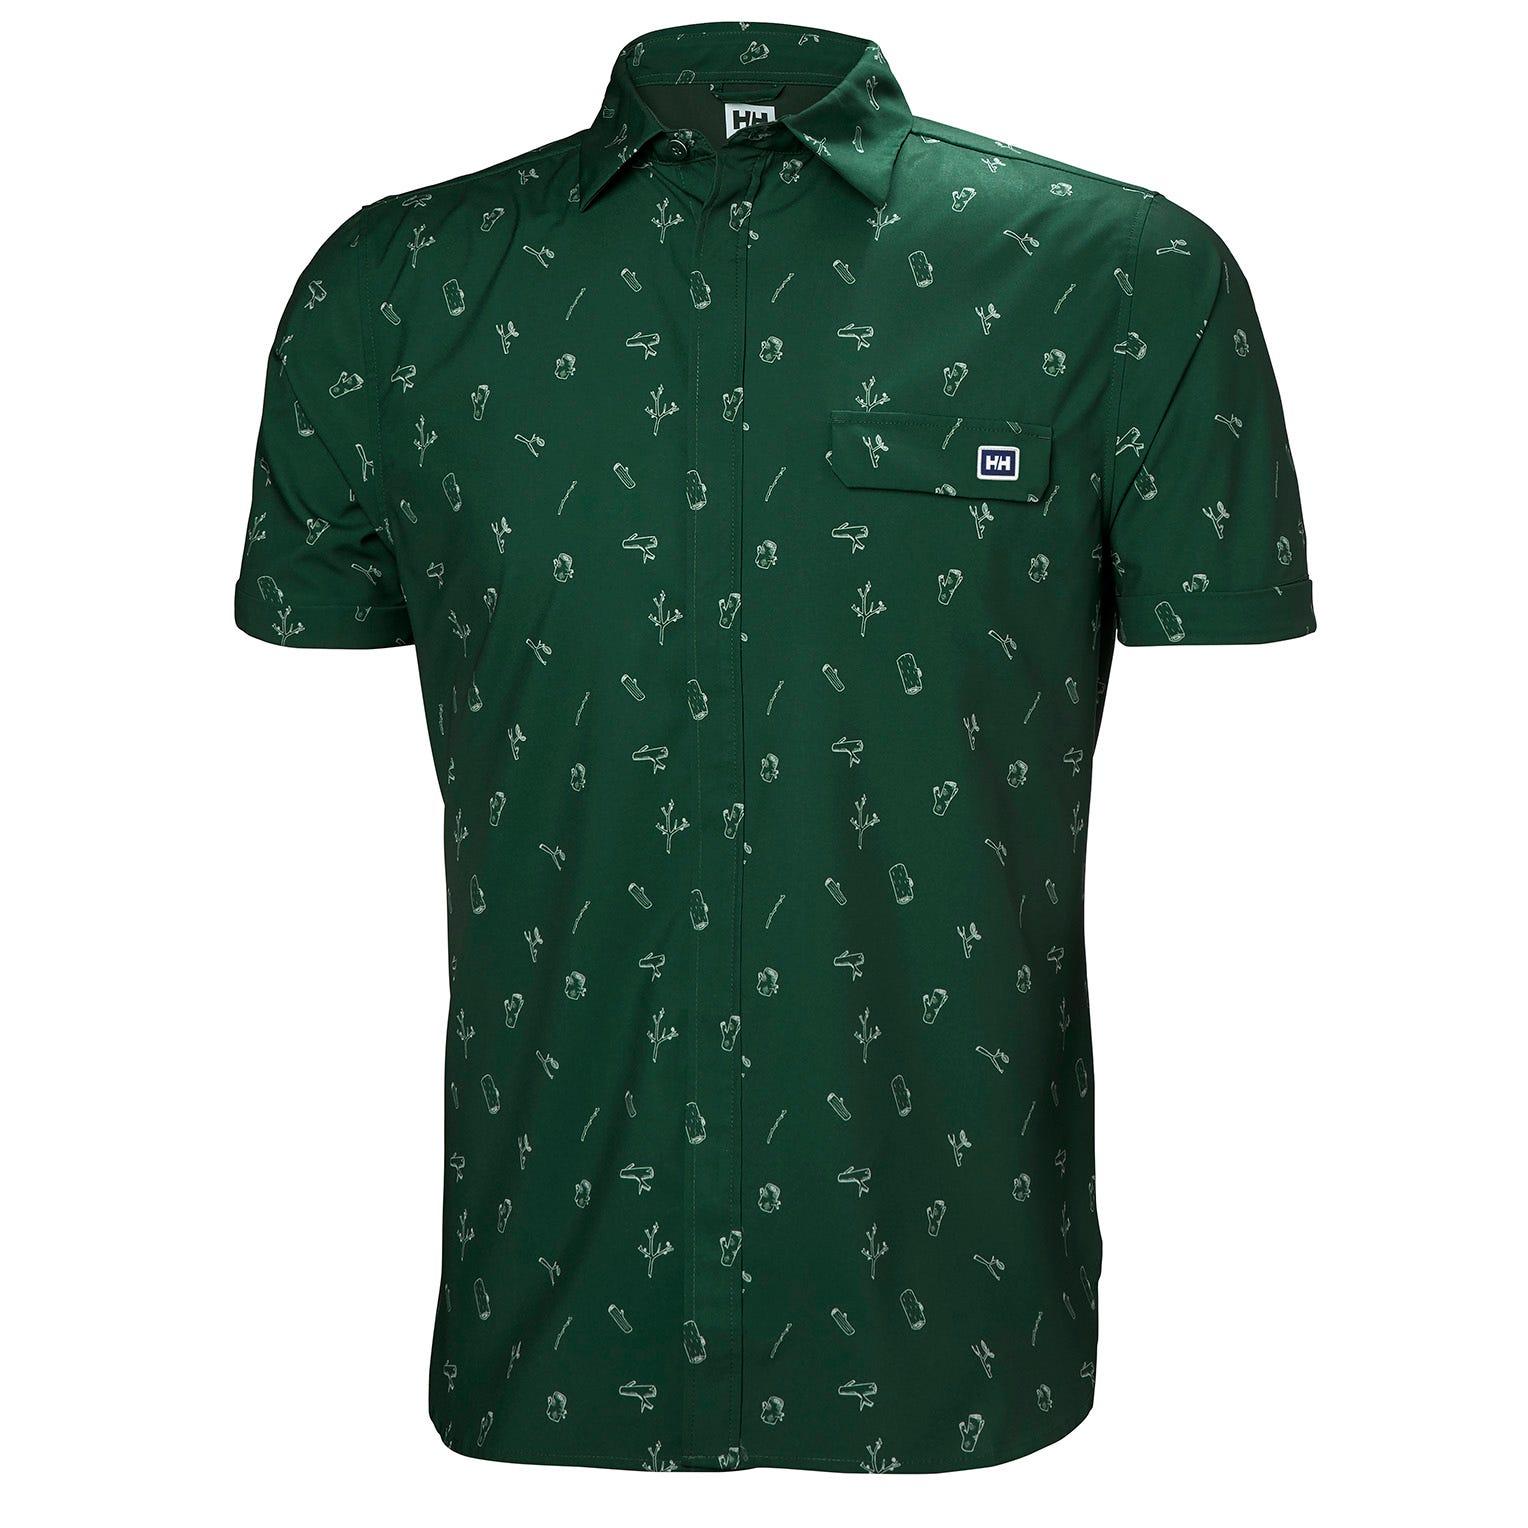 Helly Hansen Oya Shirt Mens Midlayer Green M